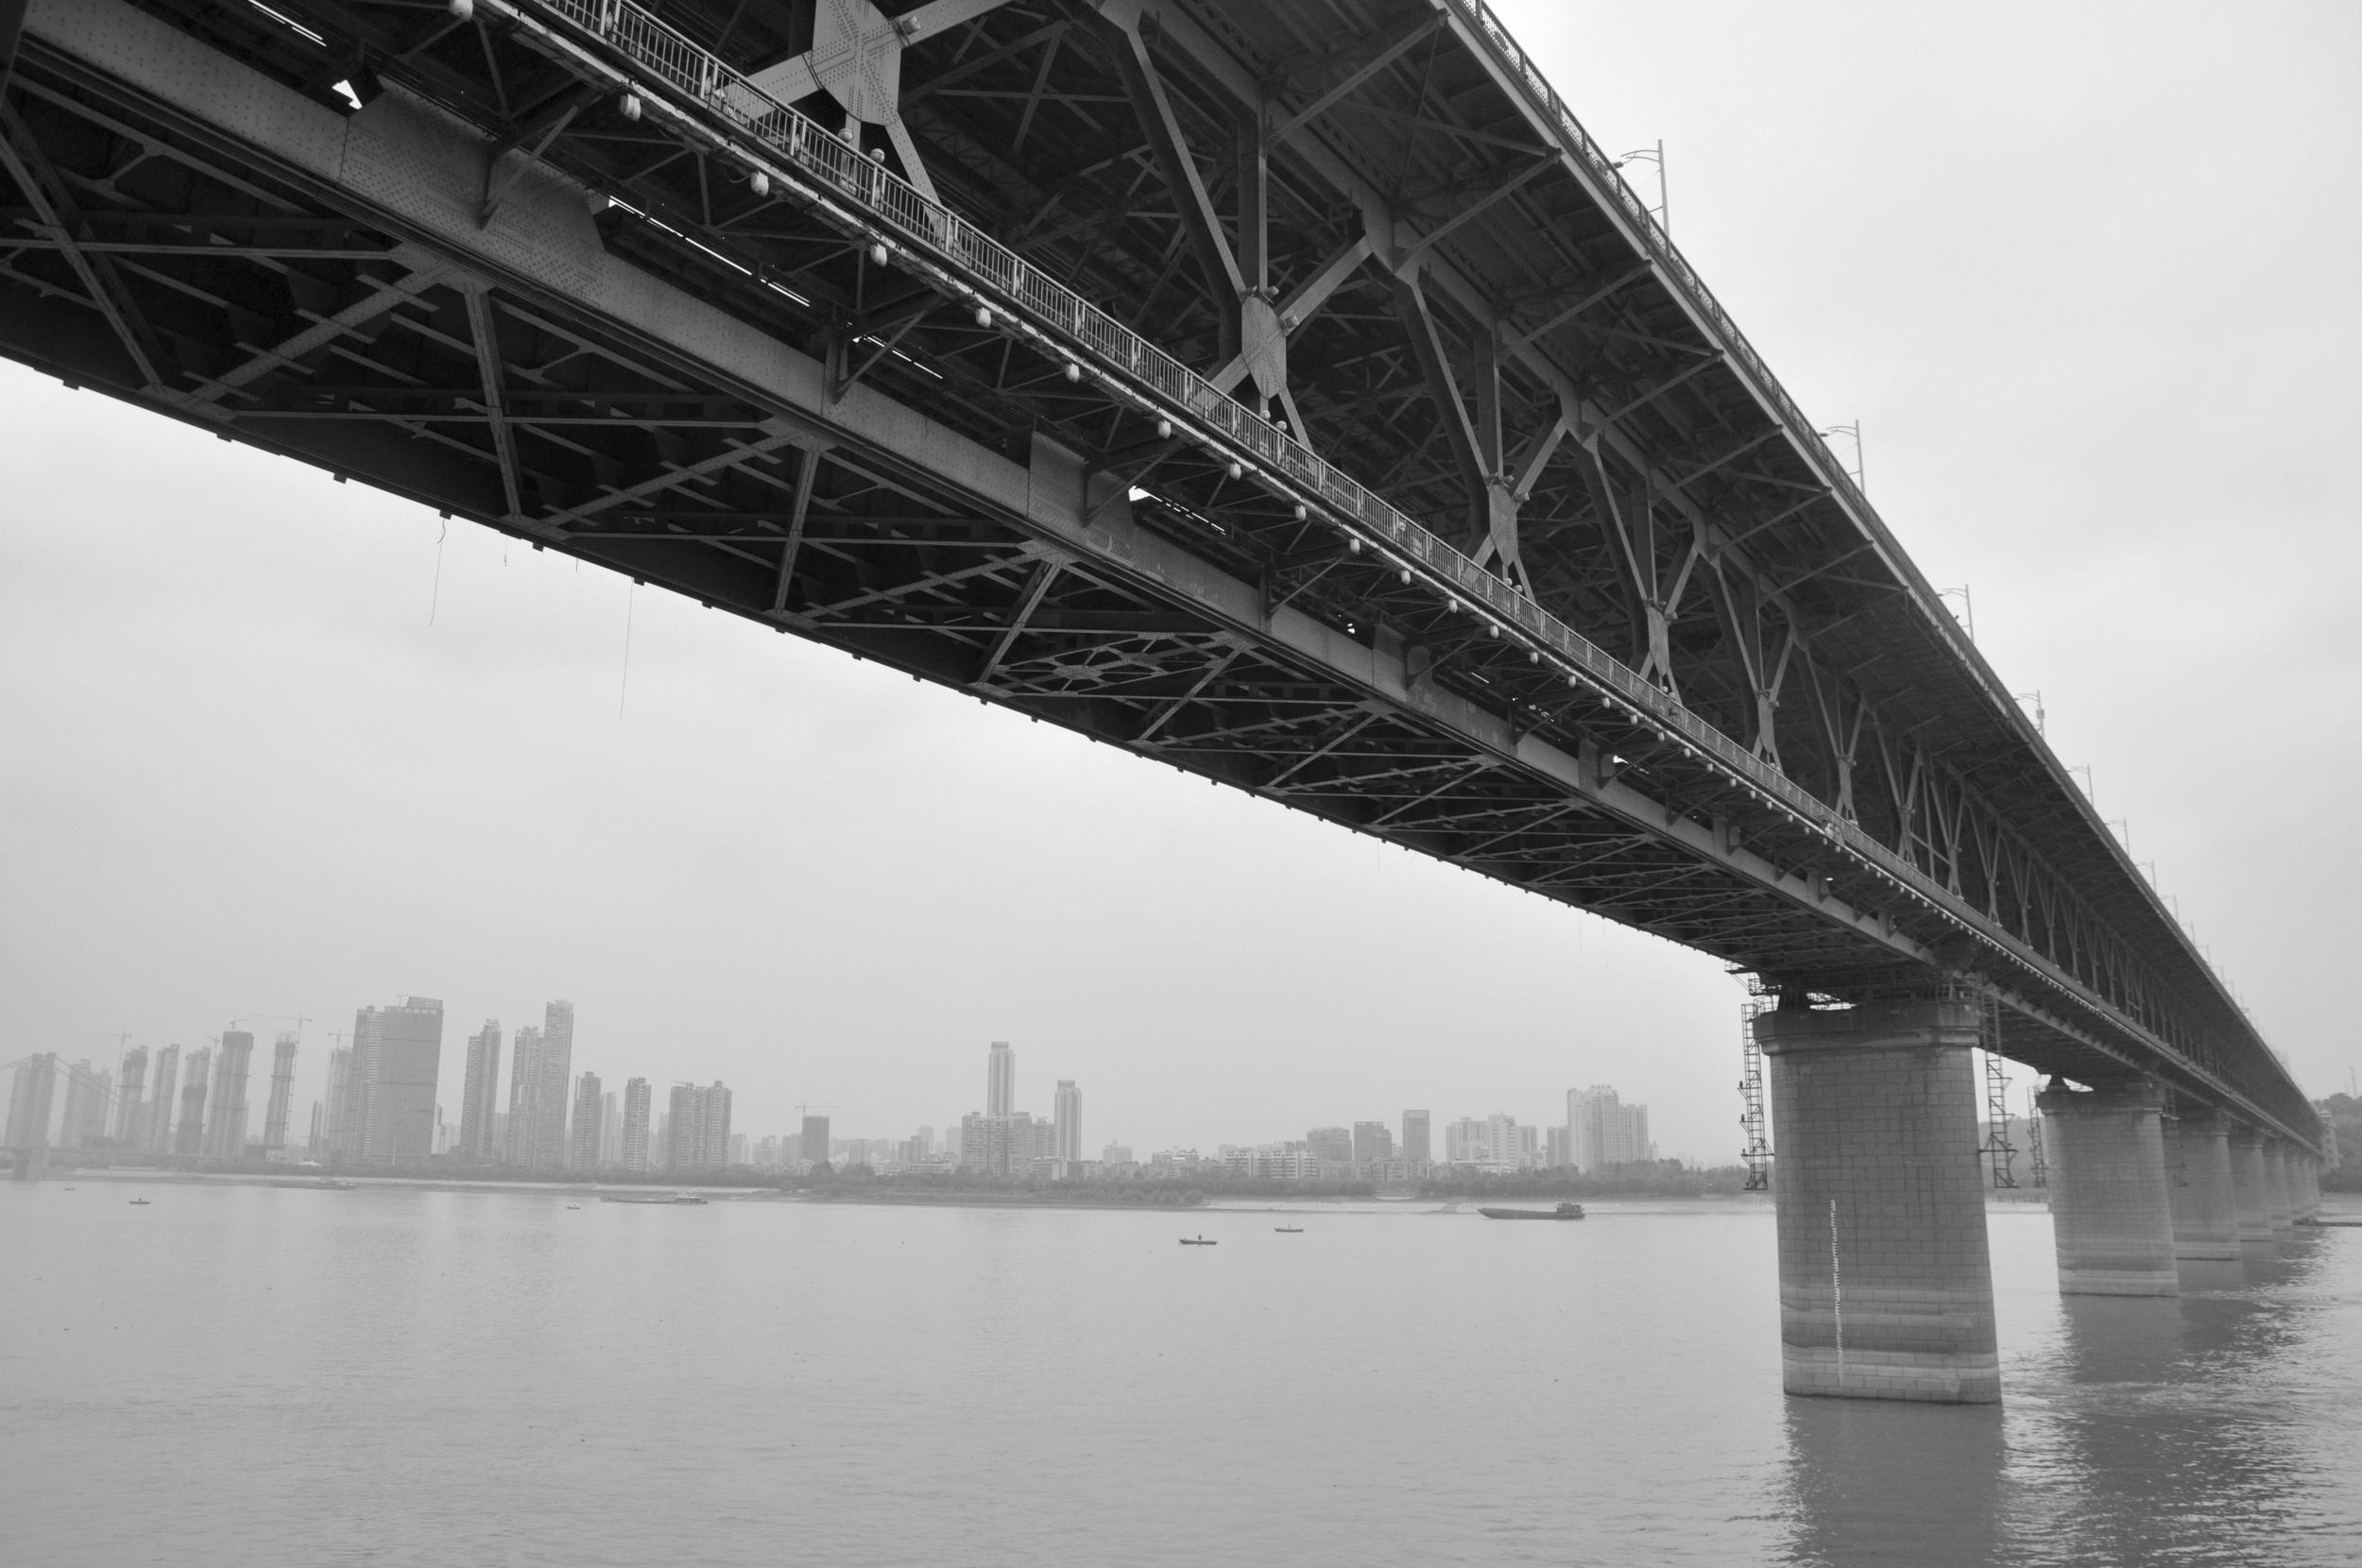 Bridge over Yangtze River, Wuhan